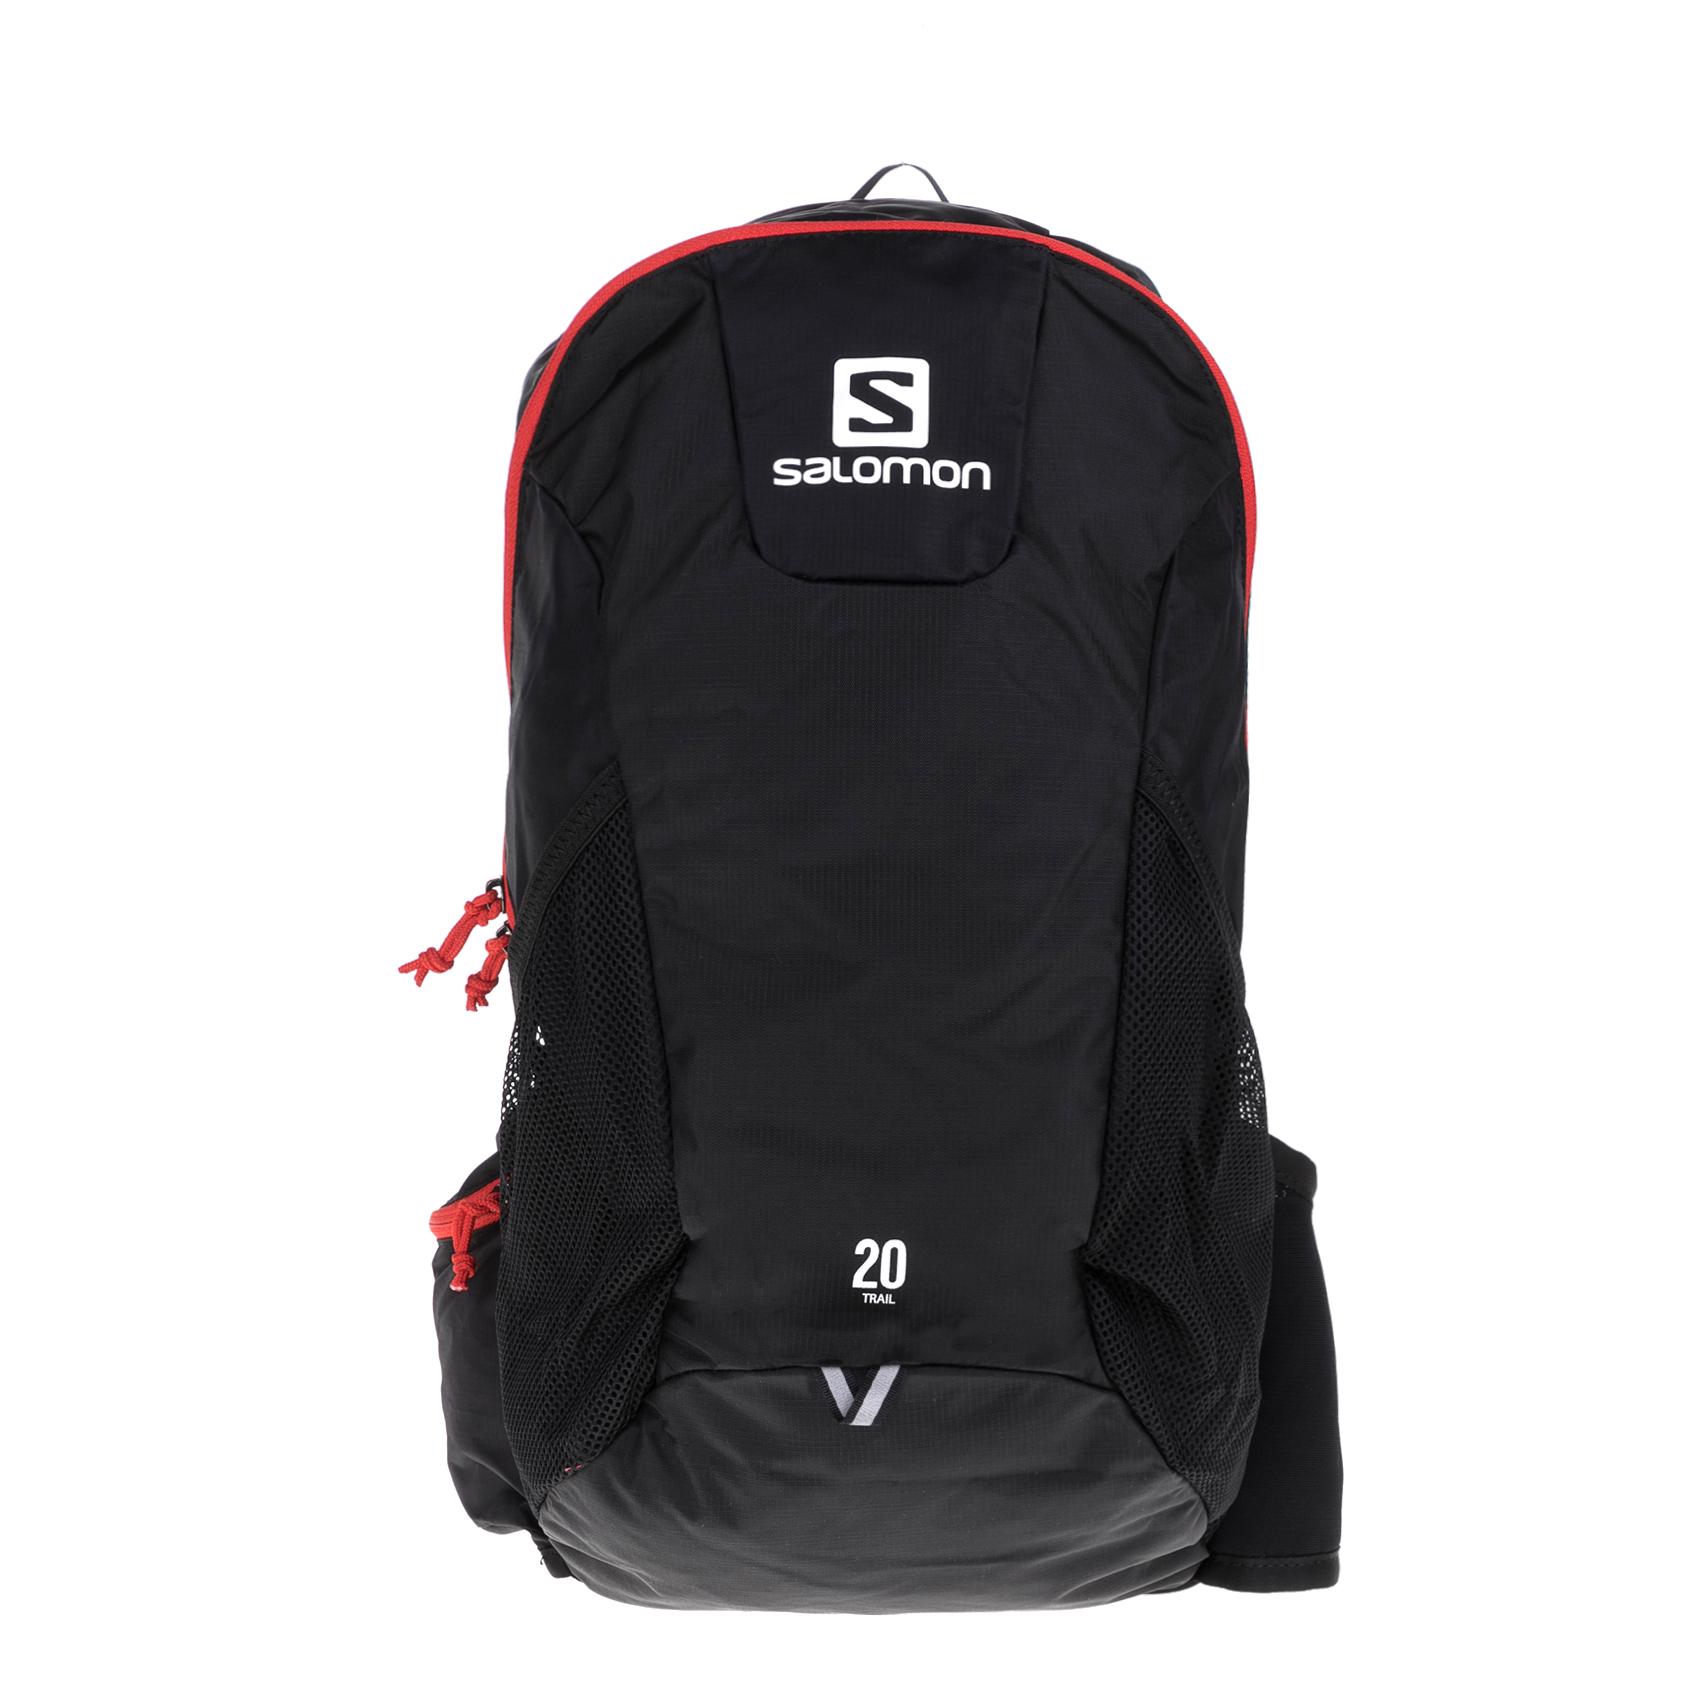 f5f76e17cc SALOMON - Σακίδιο πλάτης SALOMON PACKS BAG TRAIL 20 B μαύρο-κόκκινο